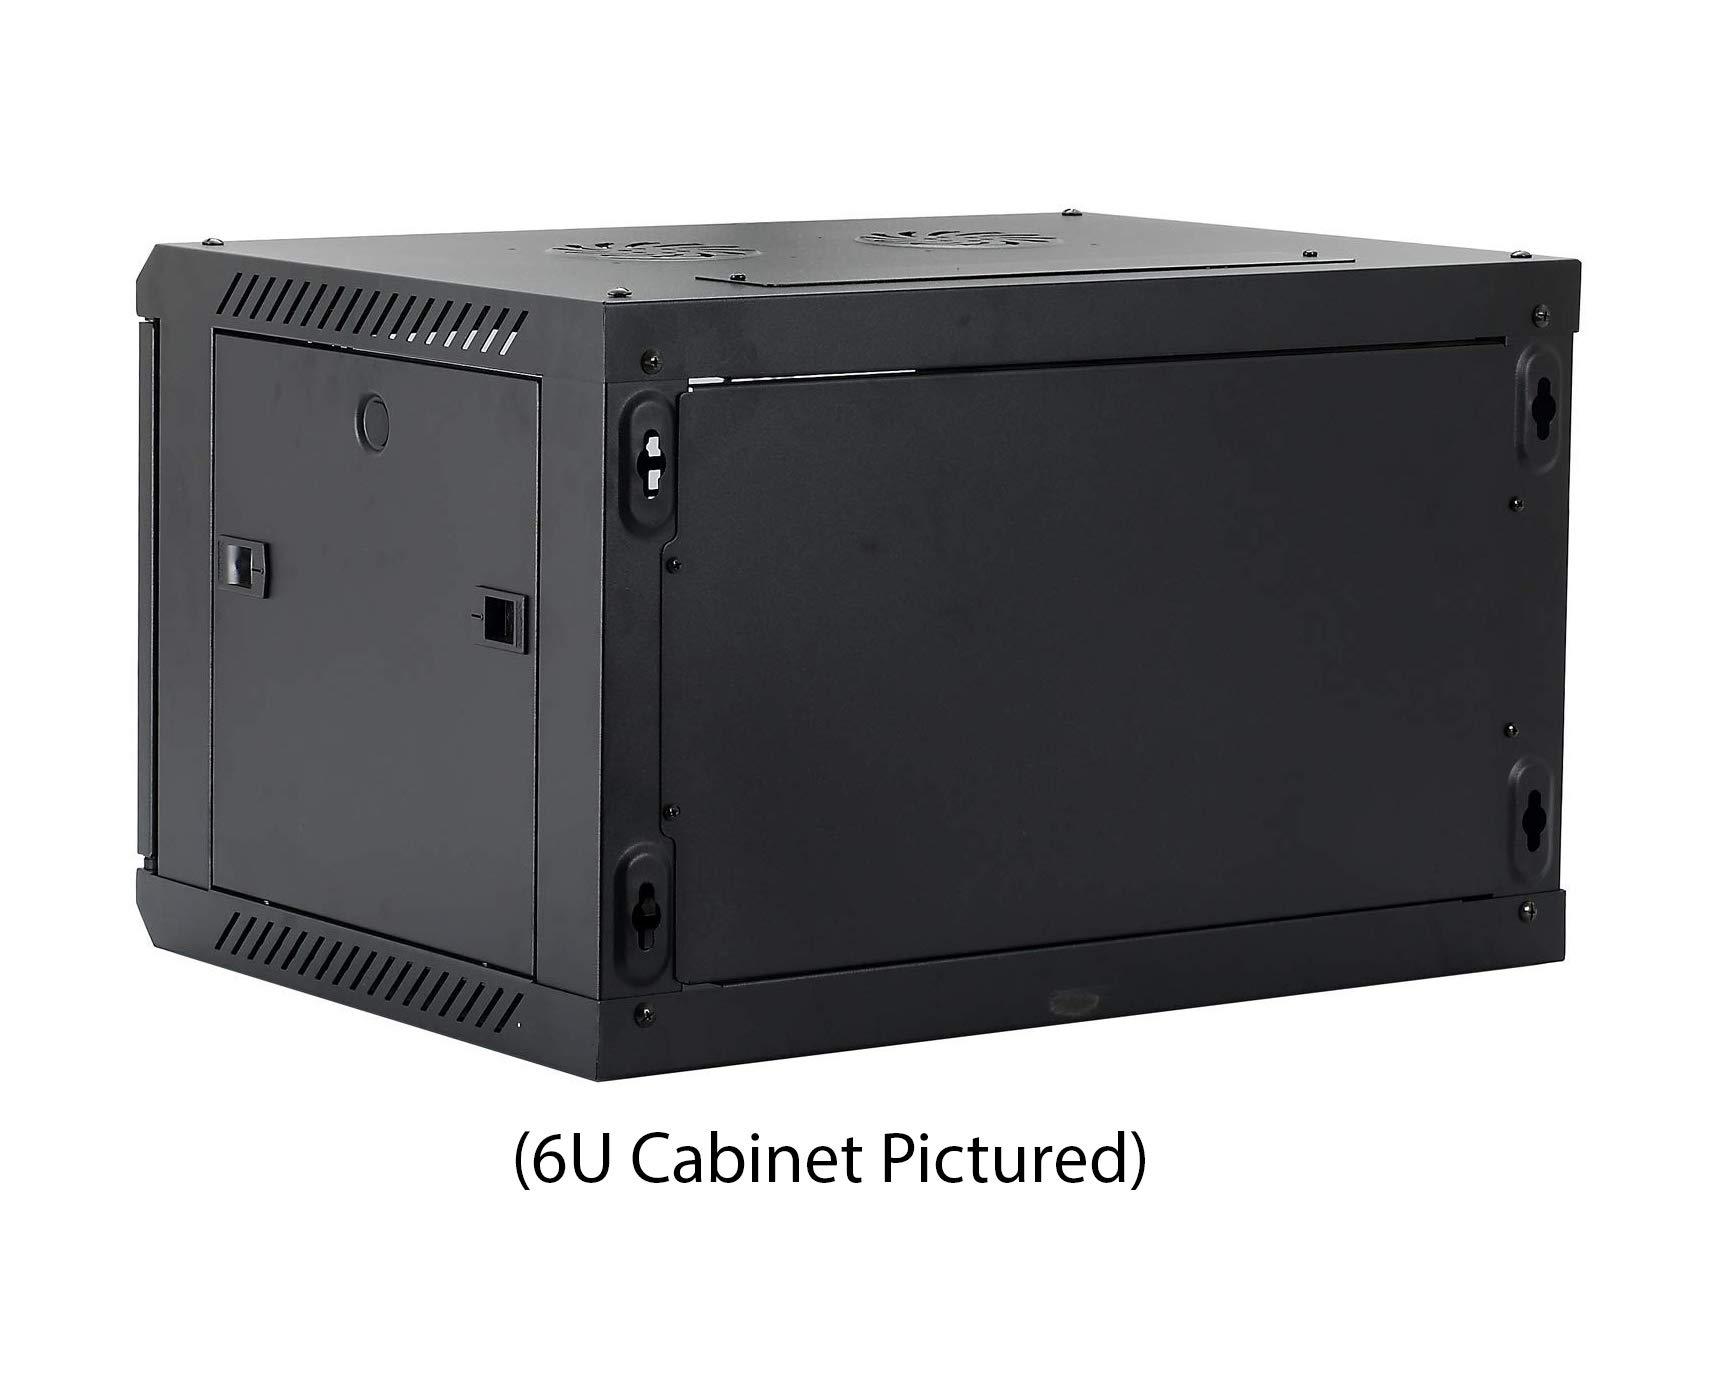 Kenuco 9U Wall Mount Rack Server Cabinet Data Network Enclosure 19-Inch Server Network Rack with Locking Glass Door Black by KENUCO (Image #6)